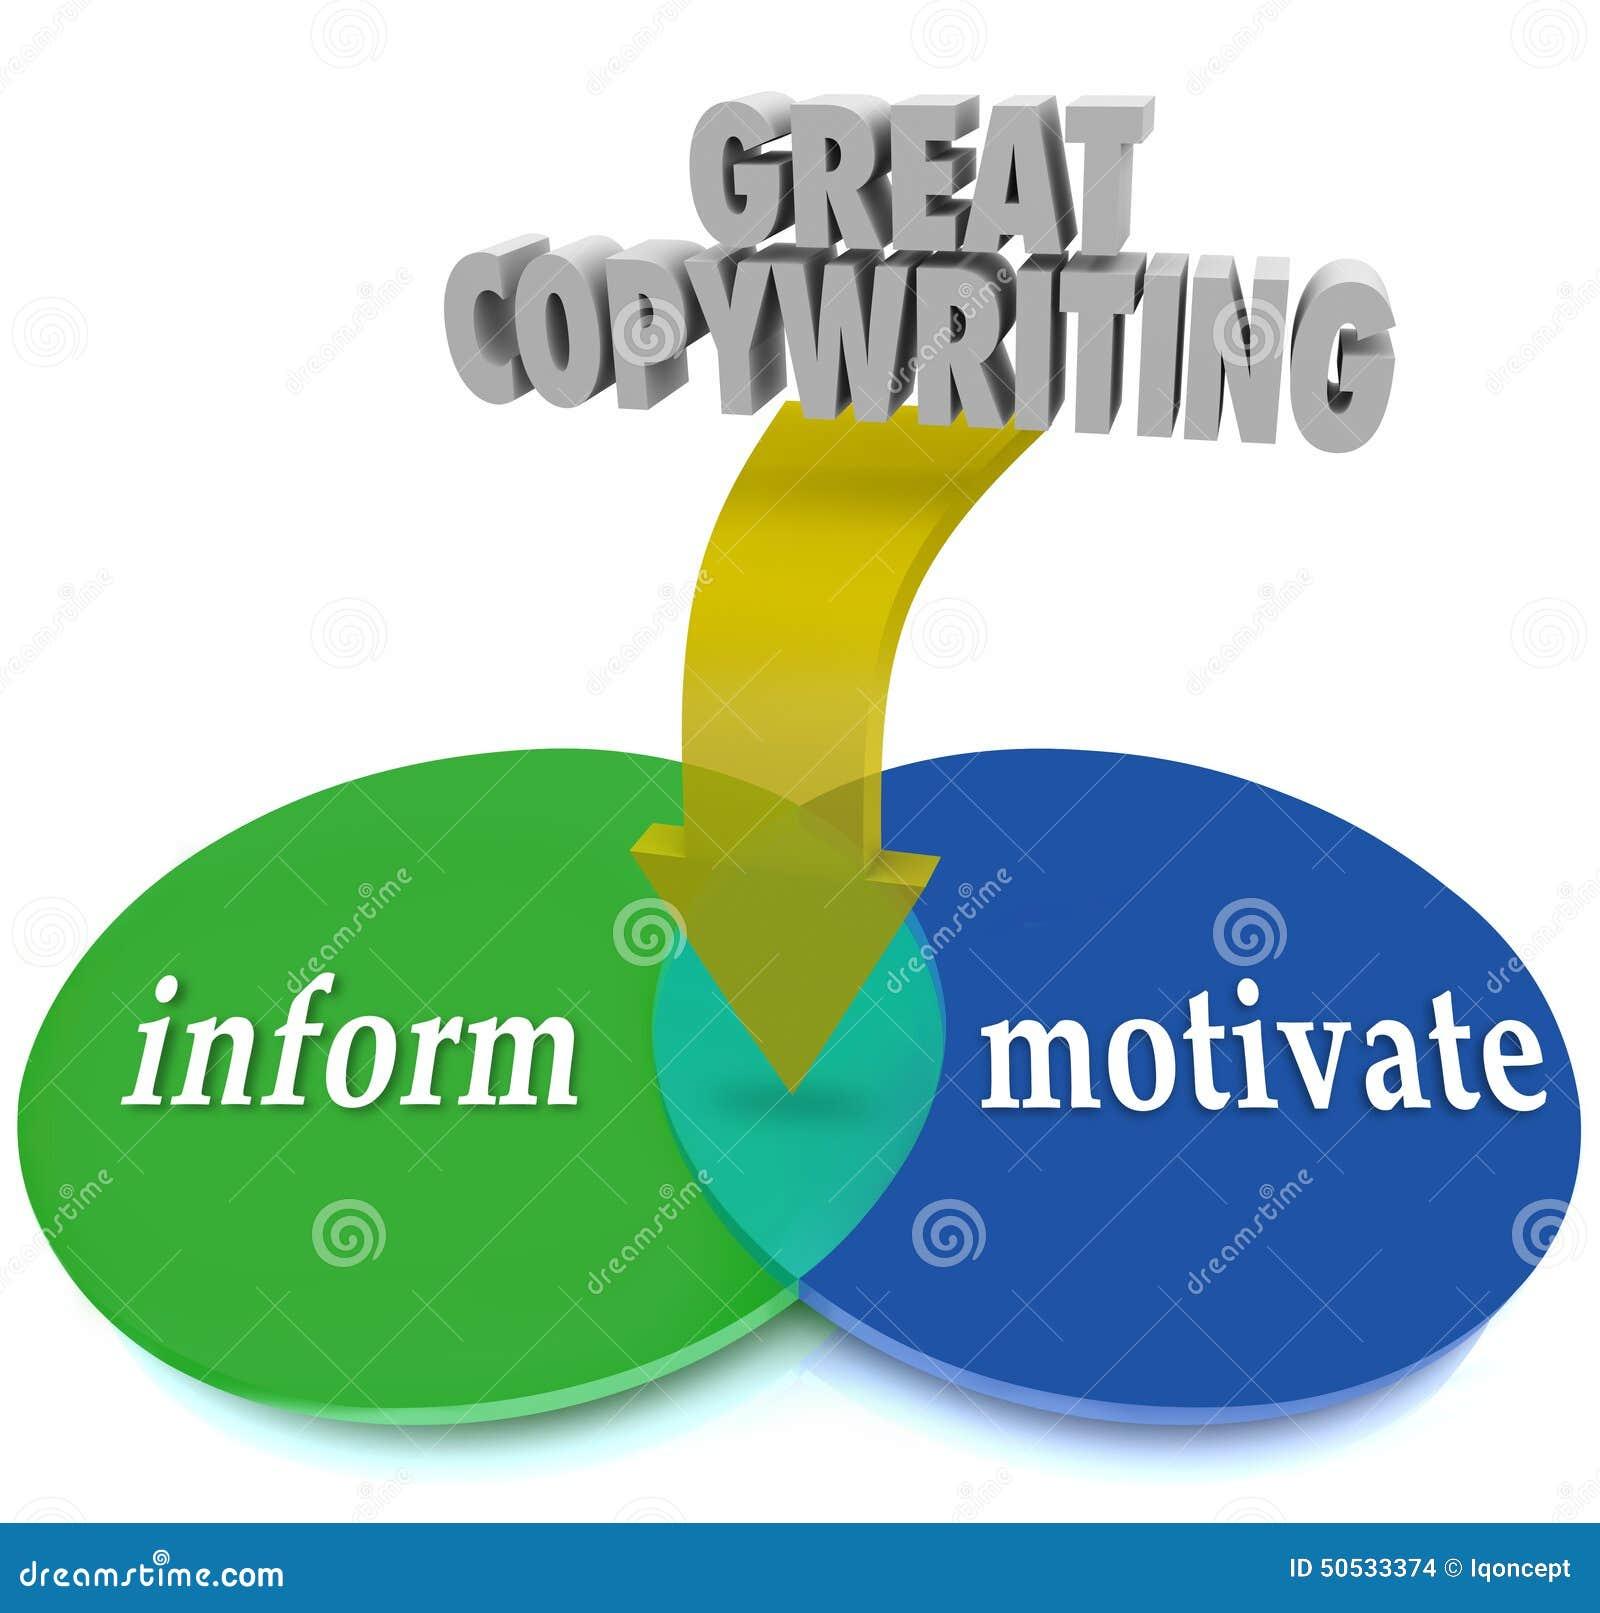 great copywriting venn diagram inform motivate move customers to rh dreamstime com Golf Flag Vector Golf Ball Vector Illustration